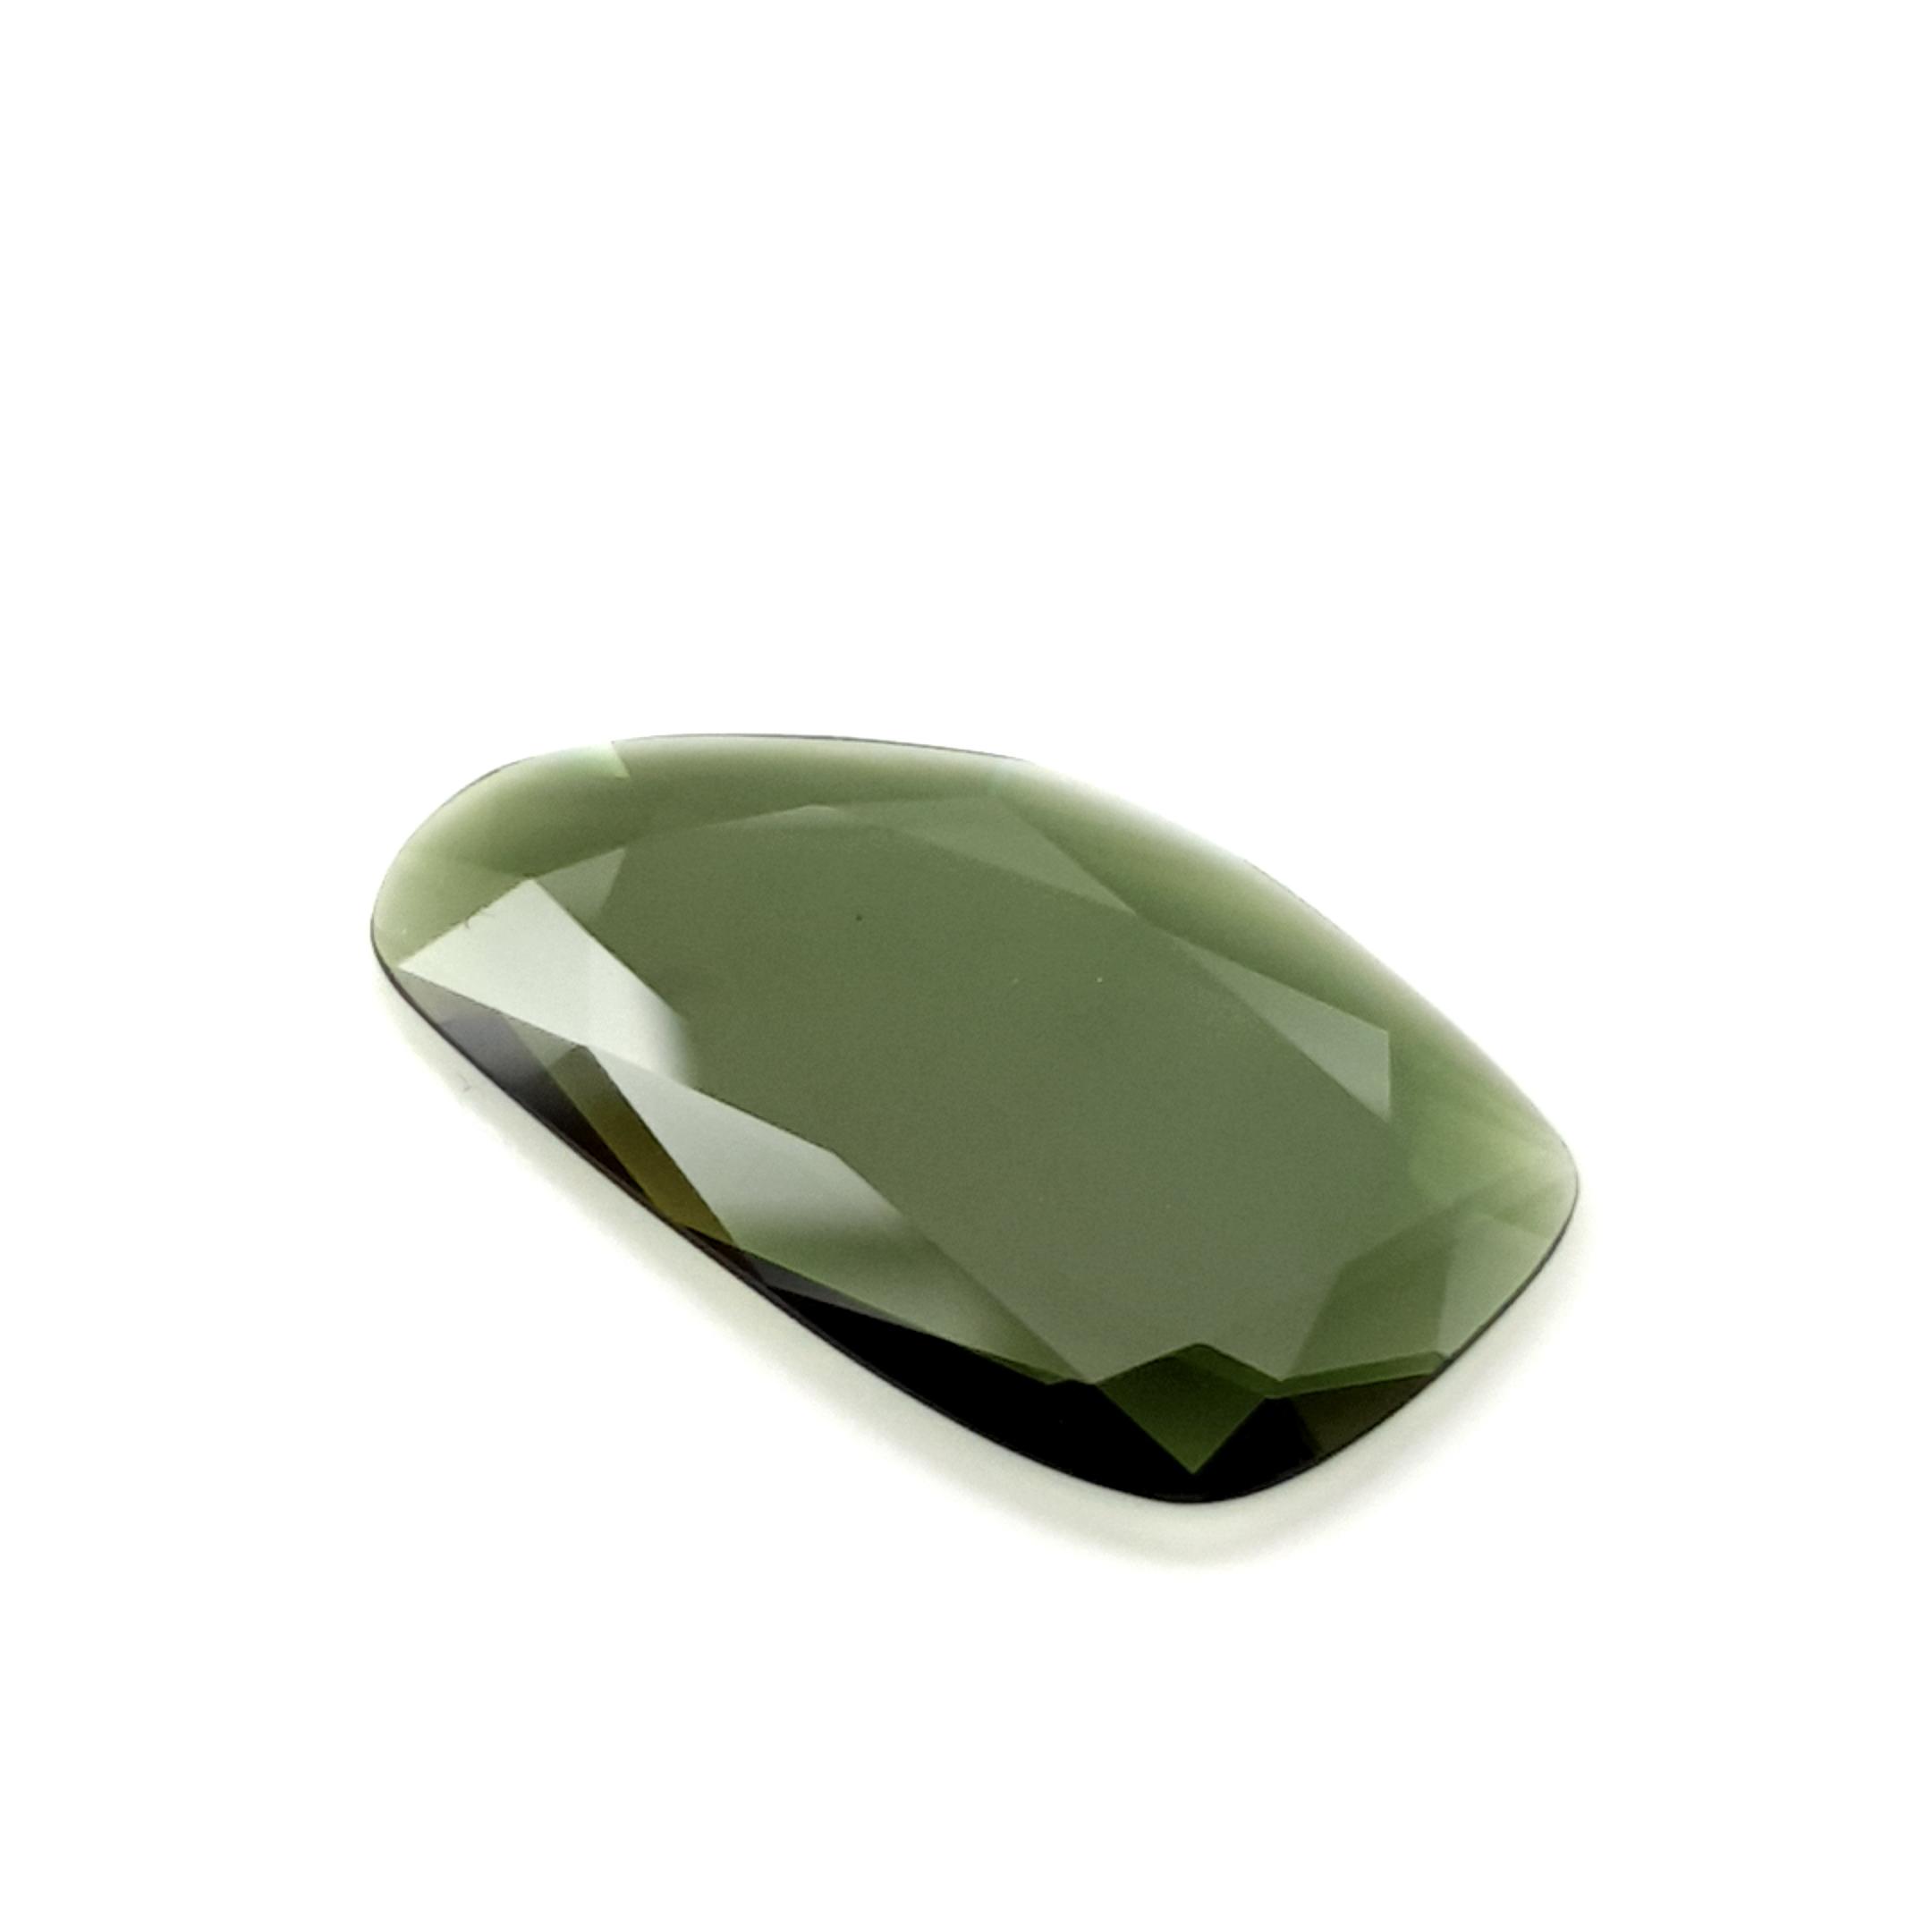 5,28ct. Imperial Green Tourmalin DoubleRoseCut TMA14C31 ClaudiaHamann__2021-02-11-17-24-35